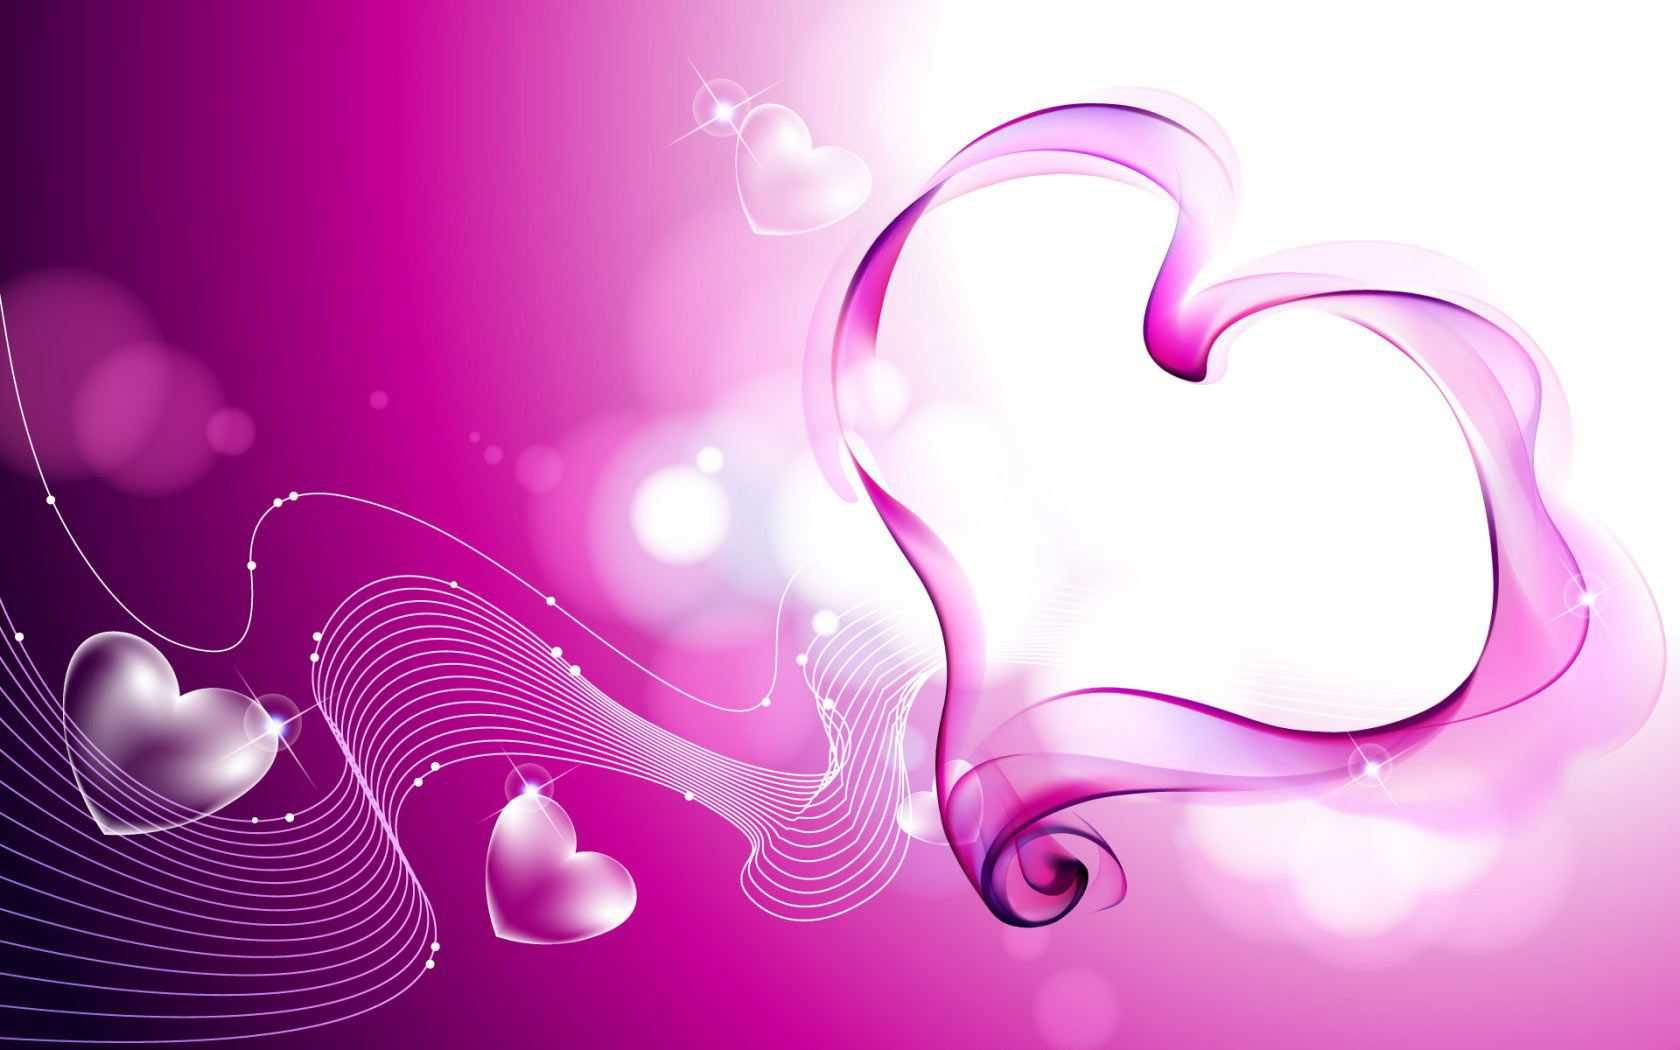 Love Heart Wallpapers HD Wallpaper